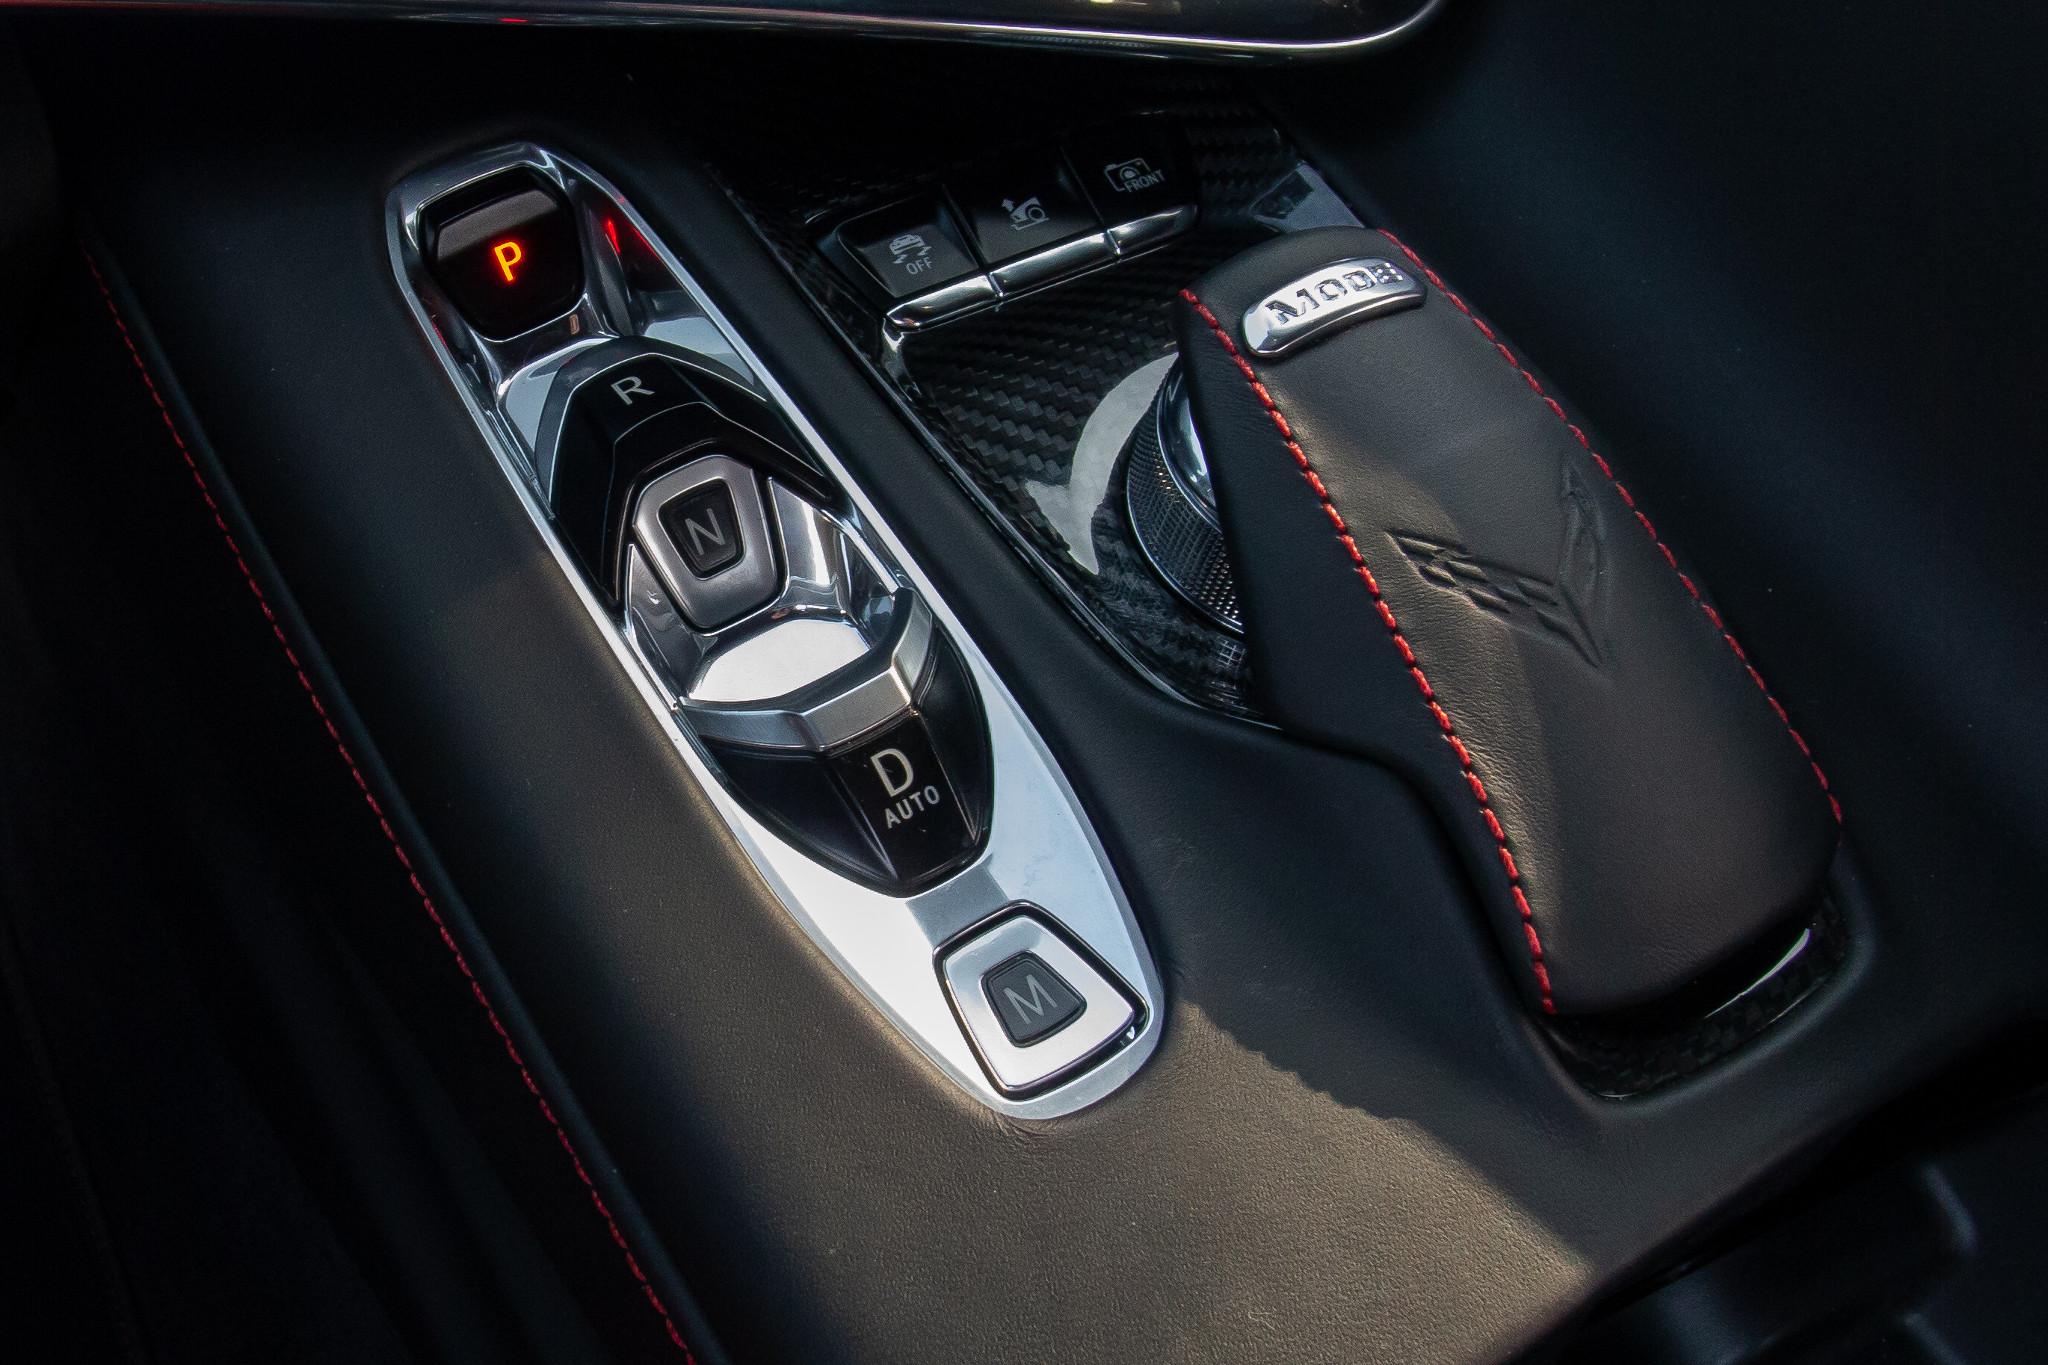 chevrolet-corvette-z51-2020-16-center-console--interior.jpg